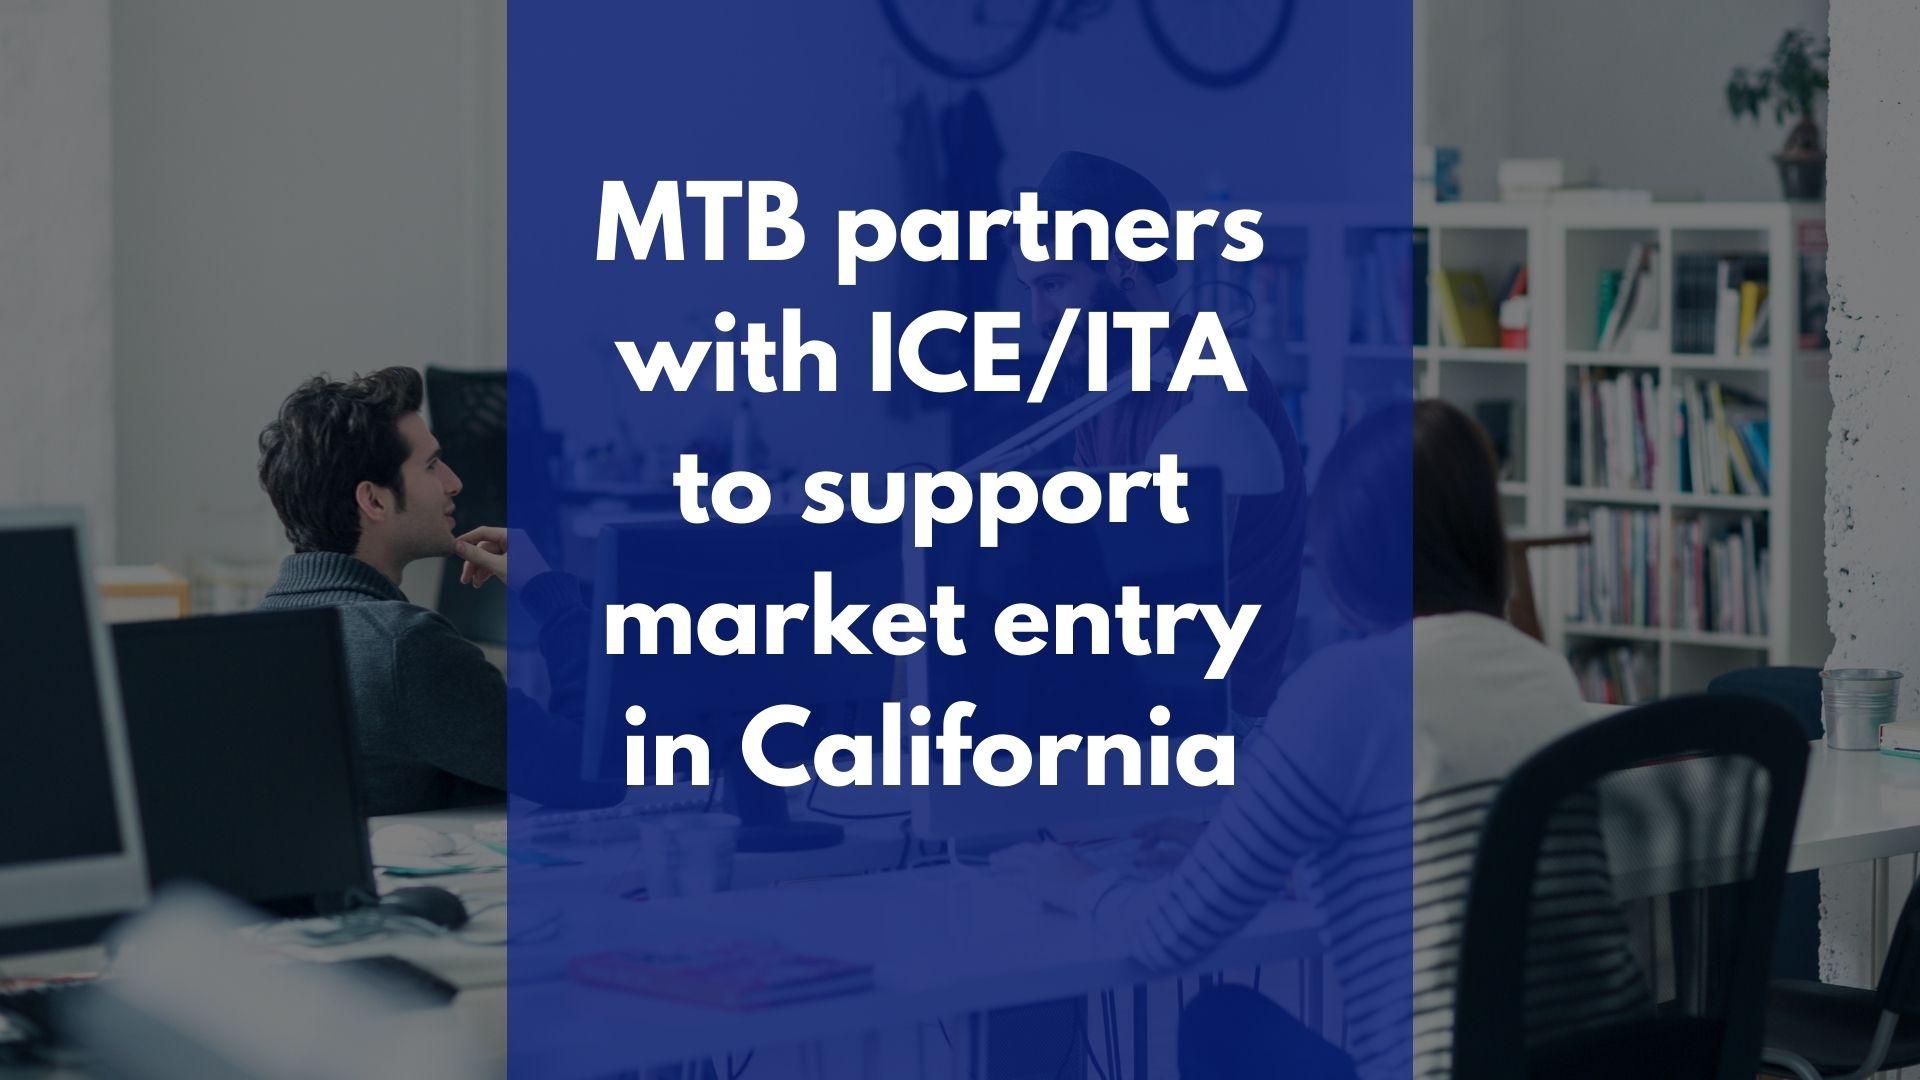 MtB partners with ICE:ITA